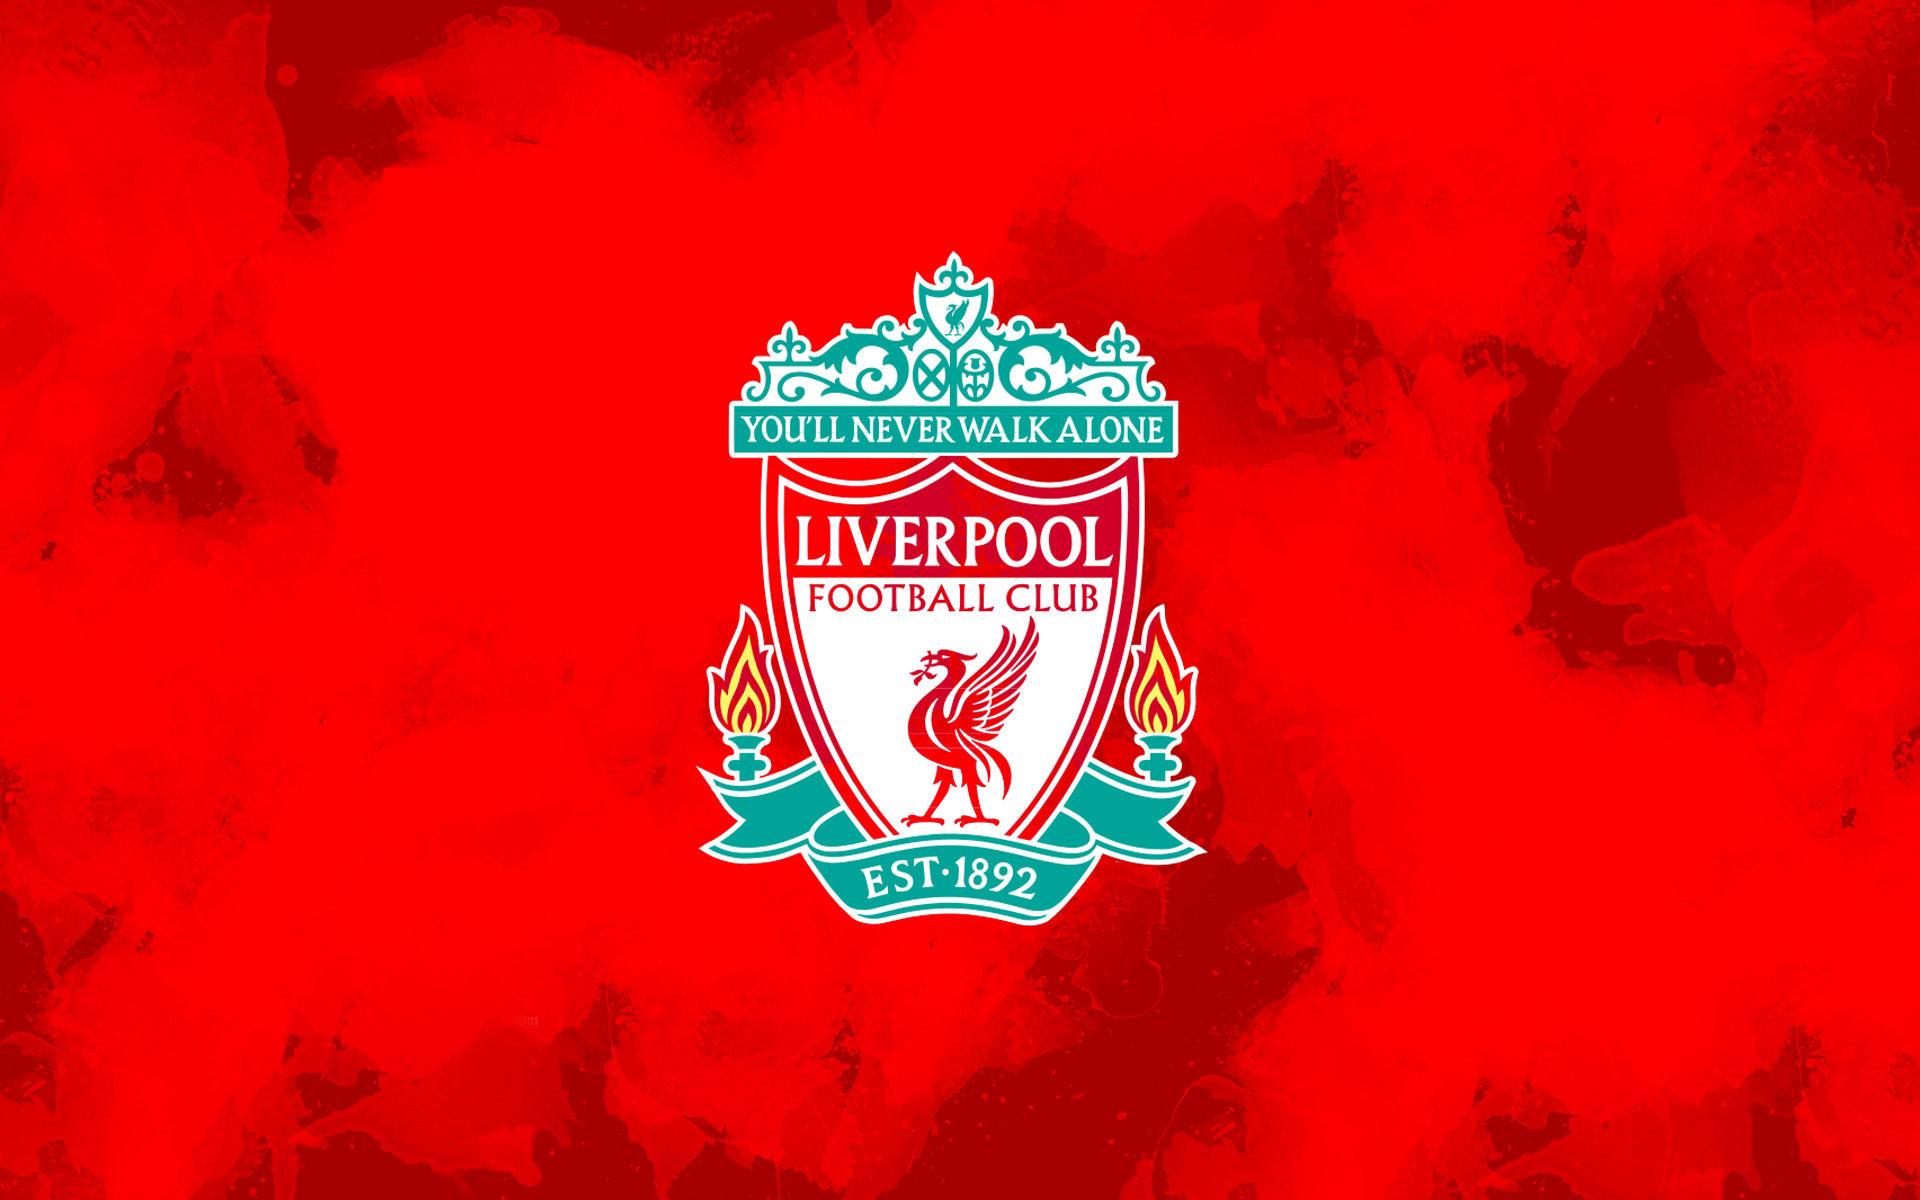 Liverpool fc logo 512x512 khmer